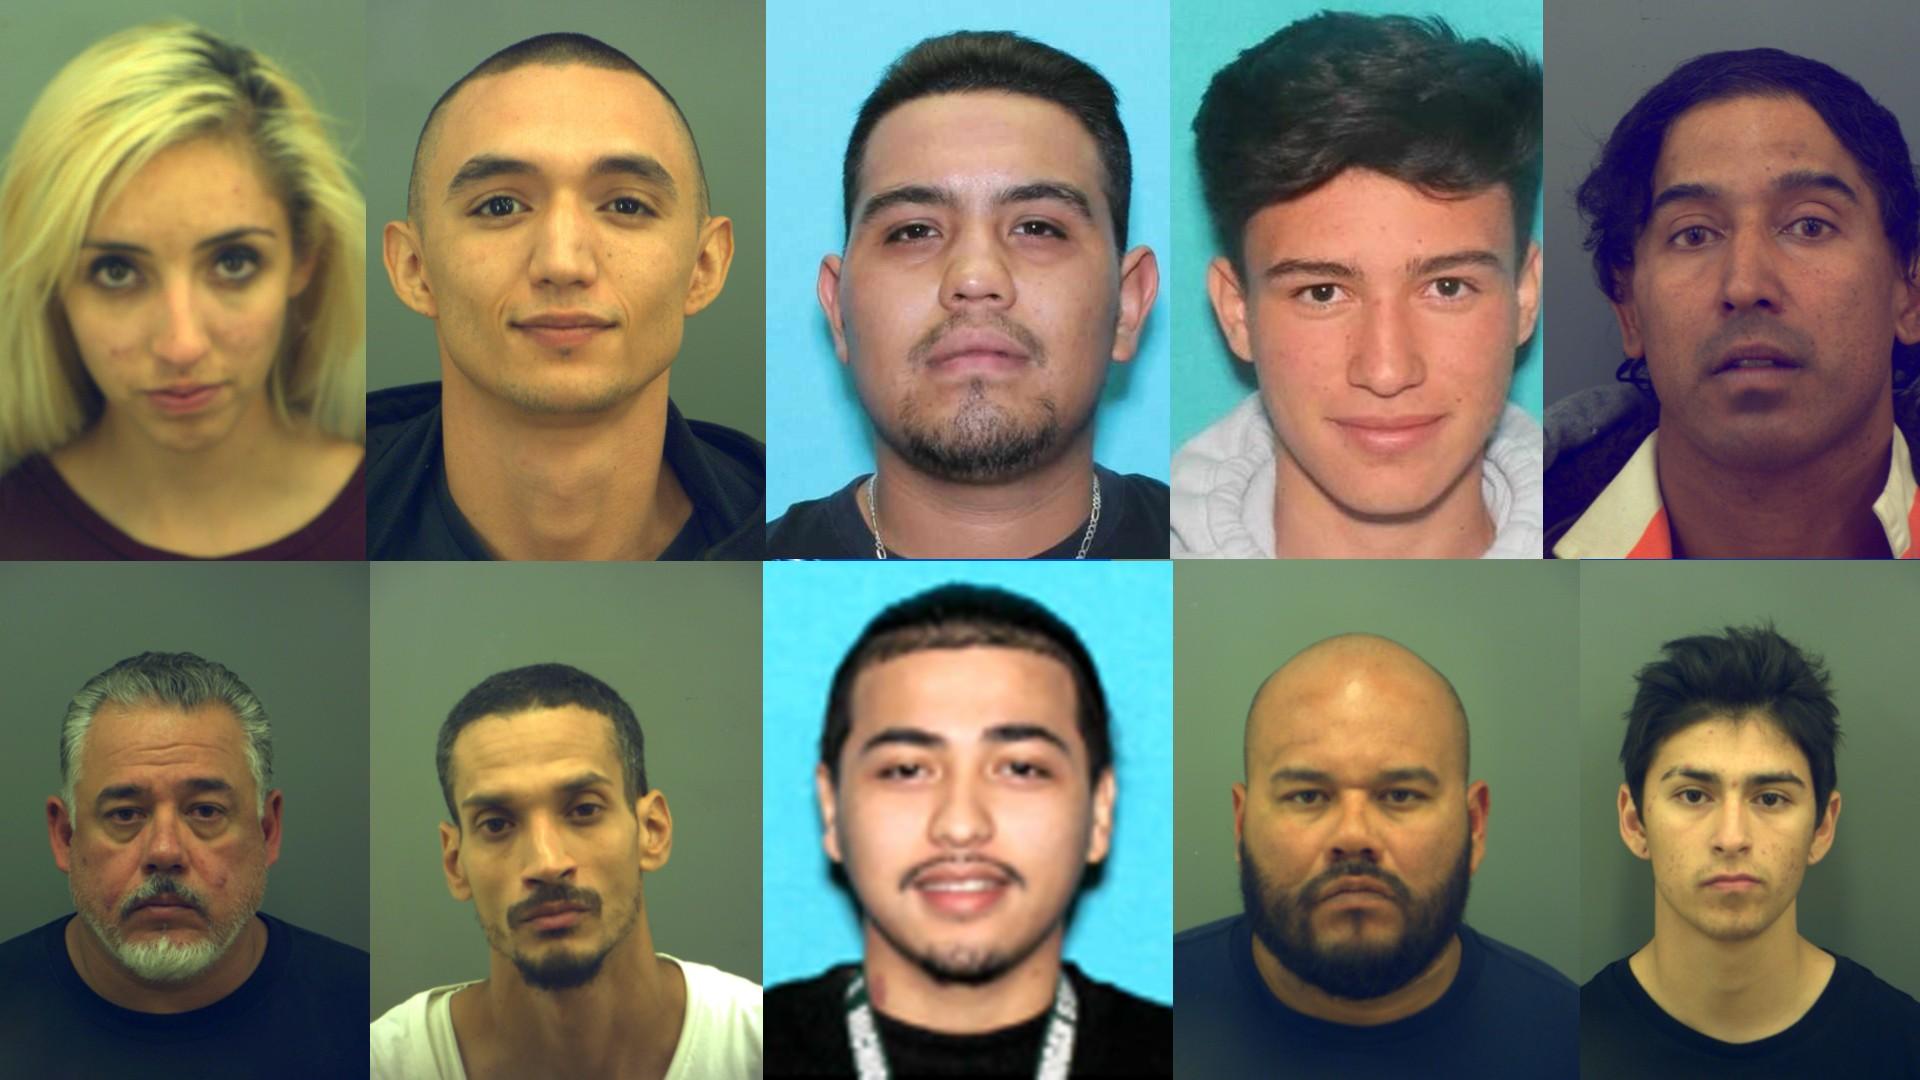 Mugshots for El Paso County's May 16 Most Wanted Fugitives